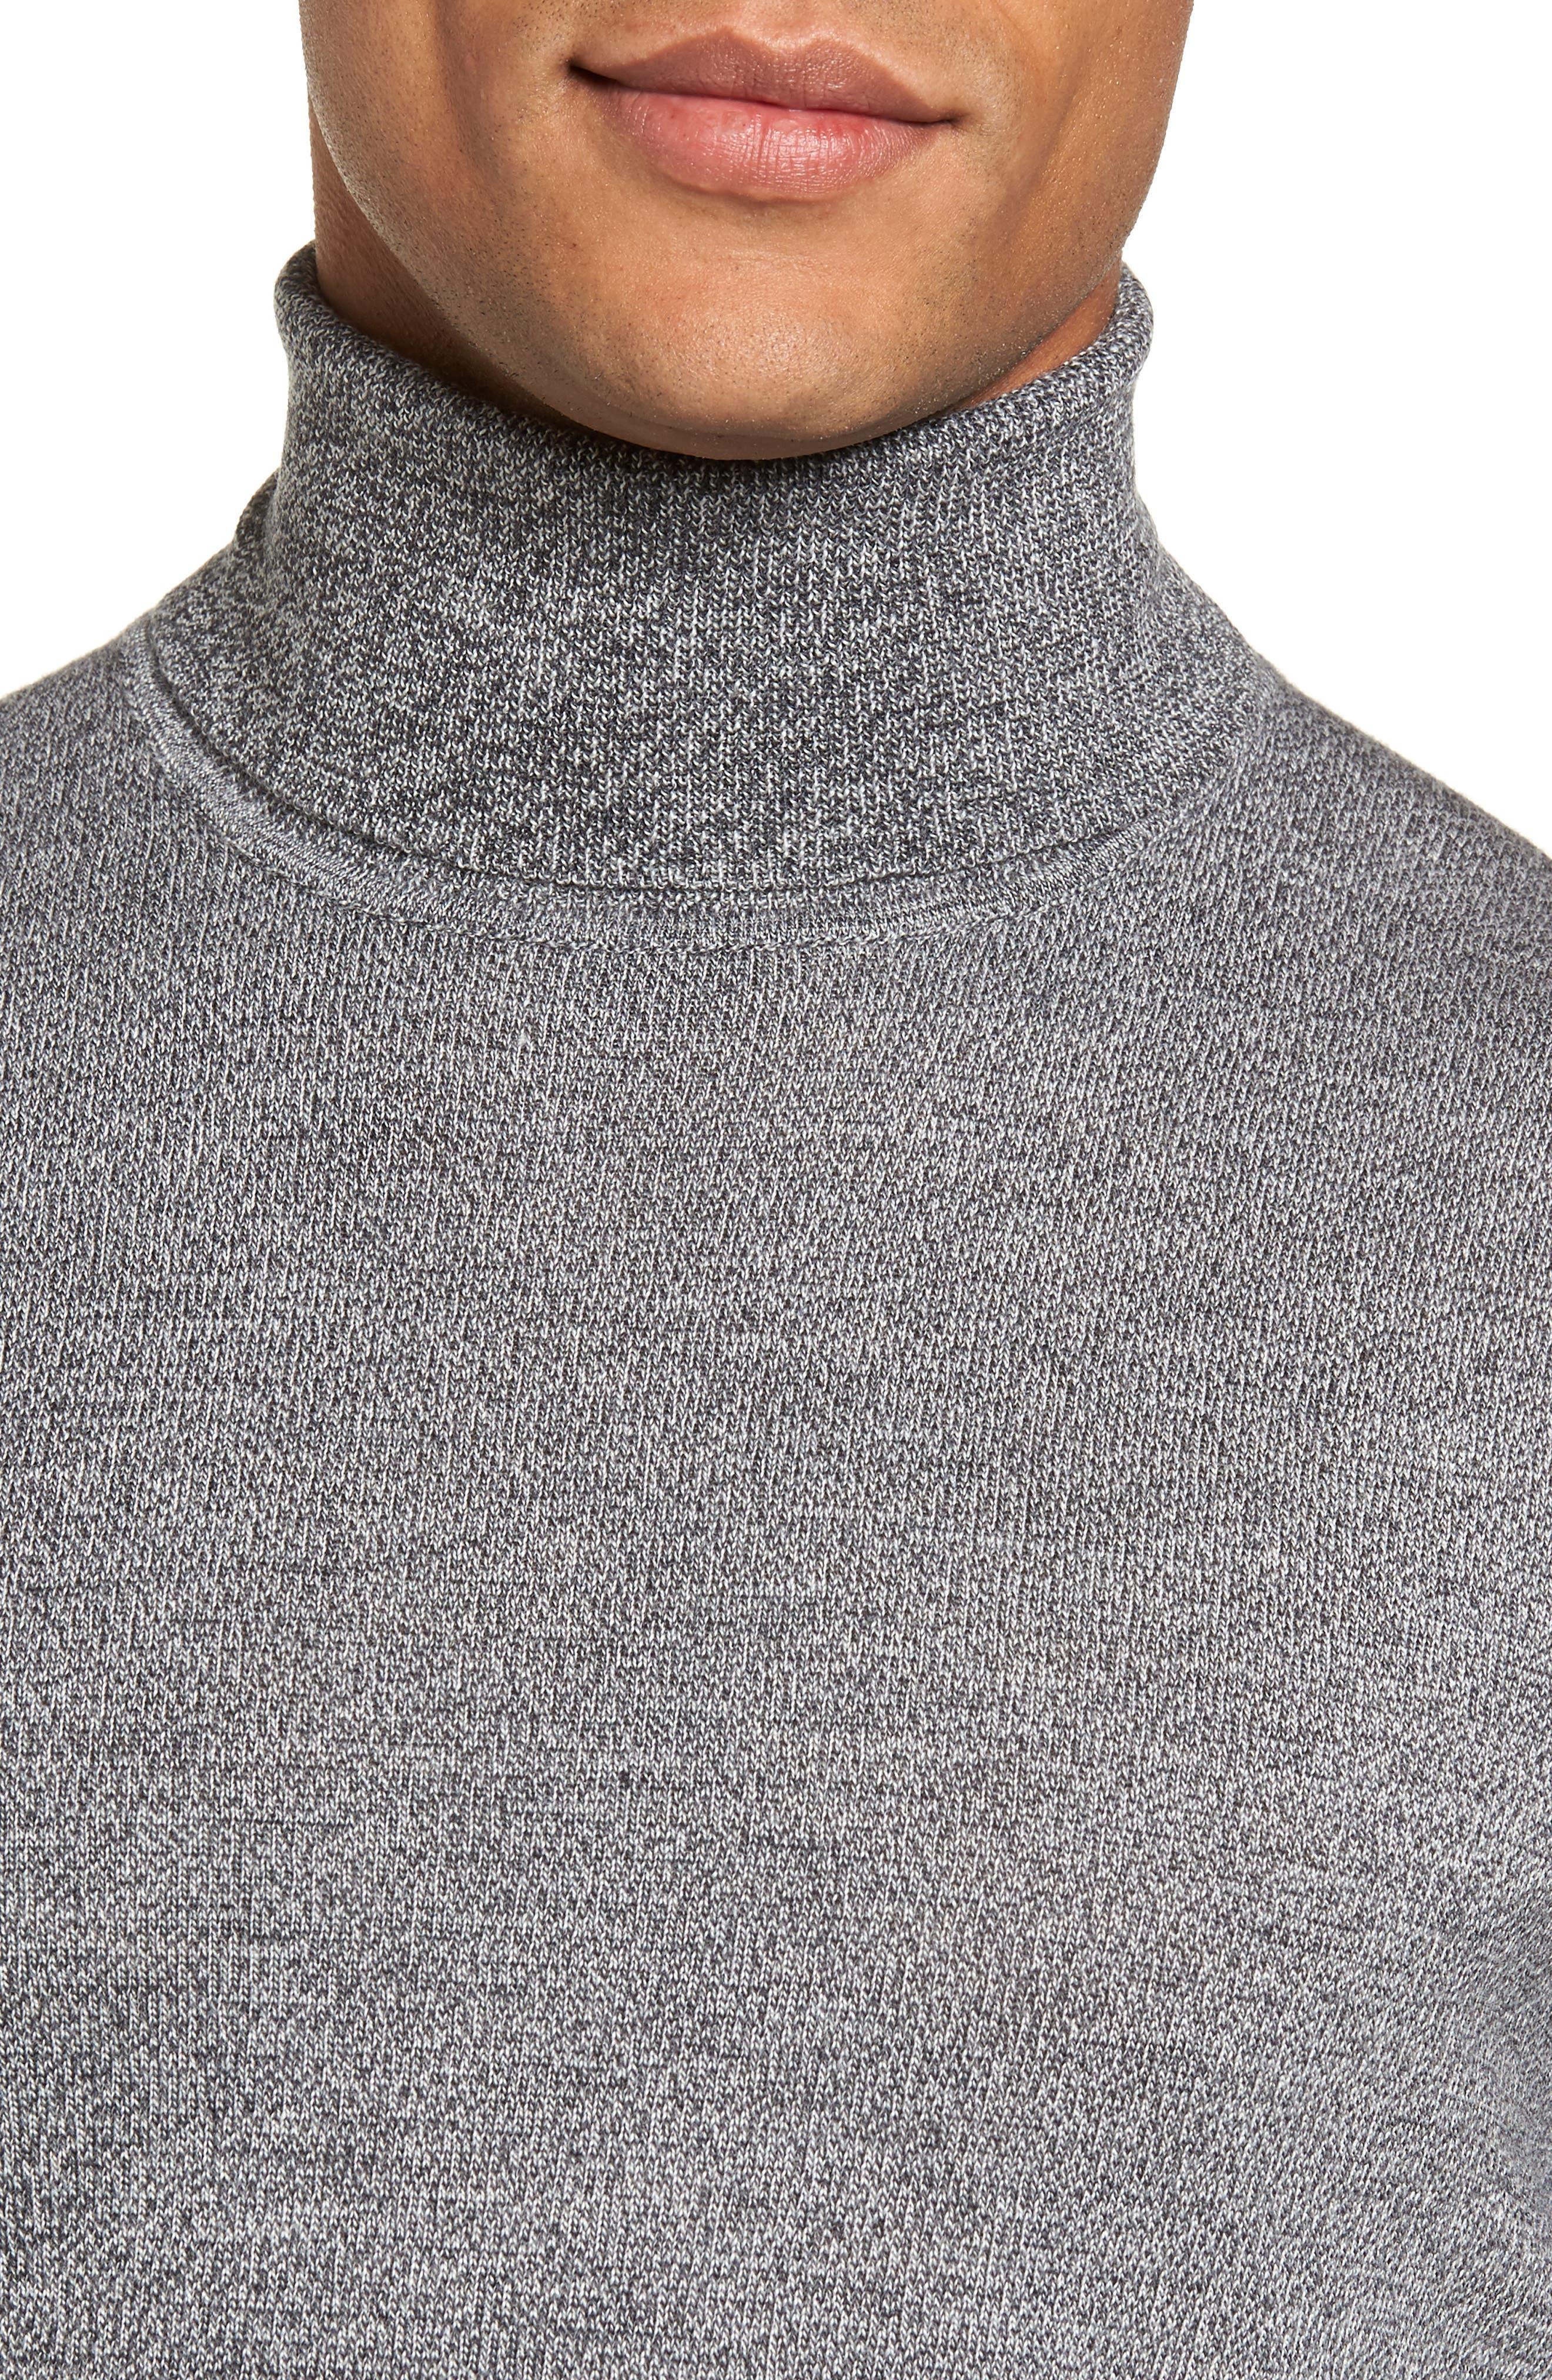 Merino Wool Turtleneck Sweater,                             Alternate thumbnail 21, color,